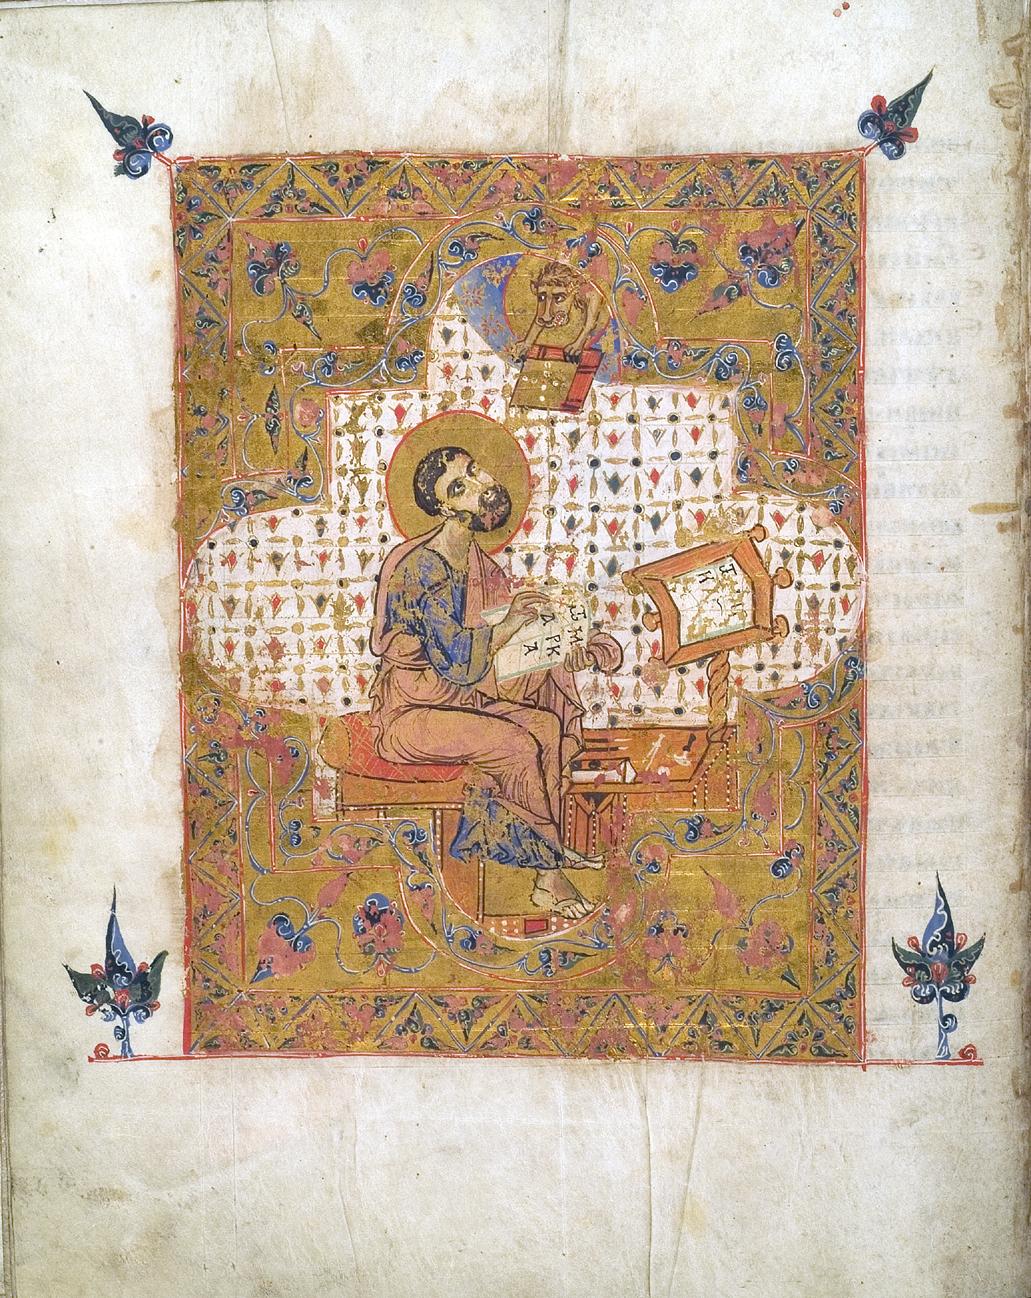 Мстиславово Евангелие, 1103–1113 гг. (ГИМ, Син. 1203). Л. 123 об. Миниатюра с изображением св. евангелиста Марка